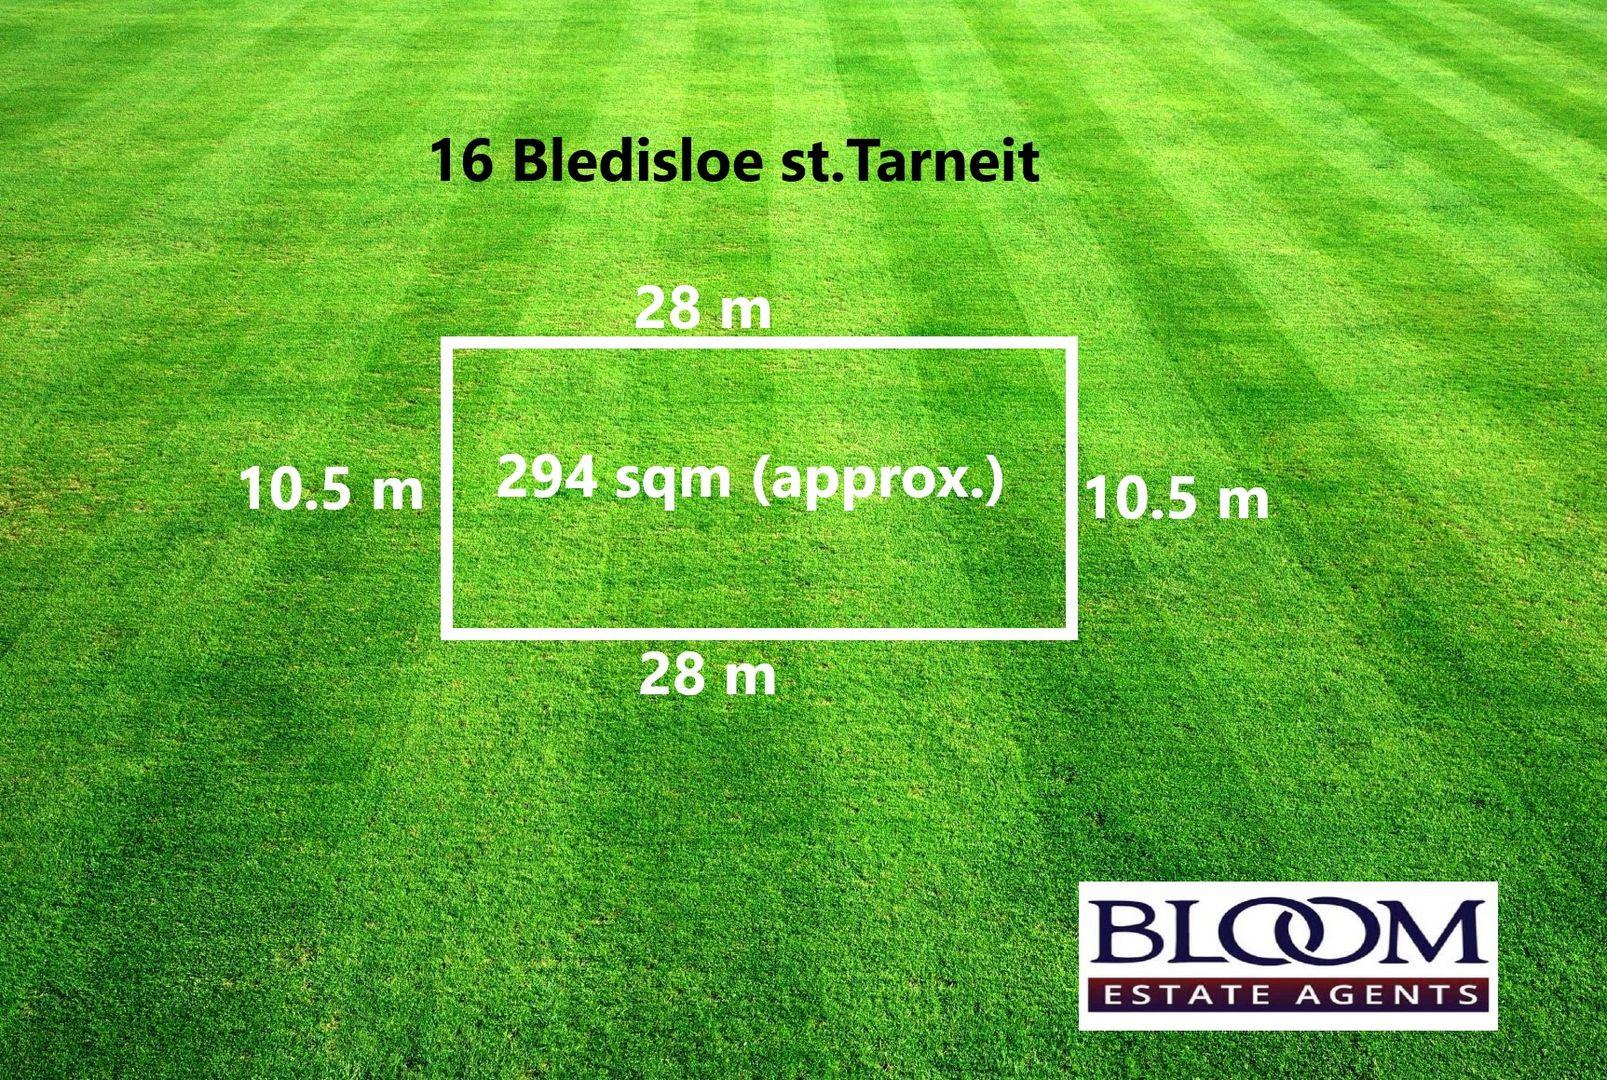 16 bledisloe street, Tarneit VIC 3029, Image 0